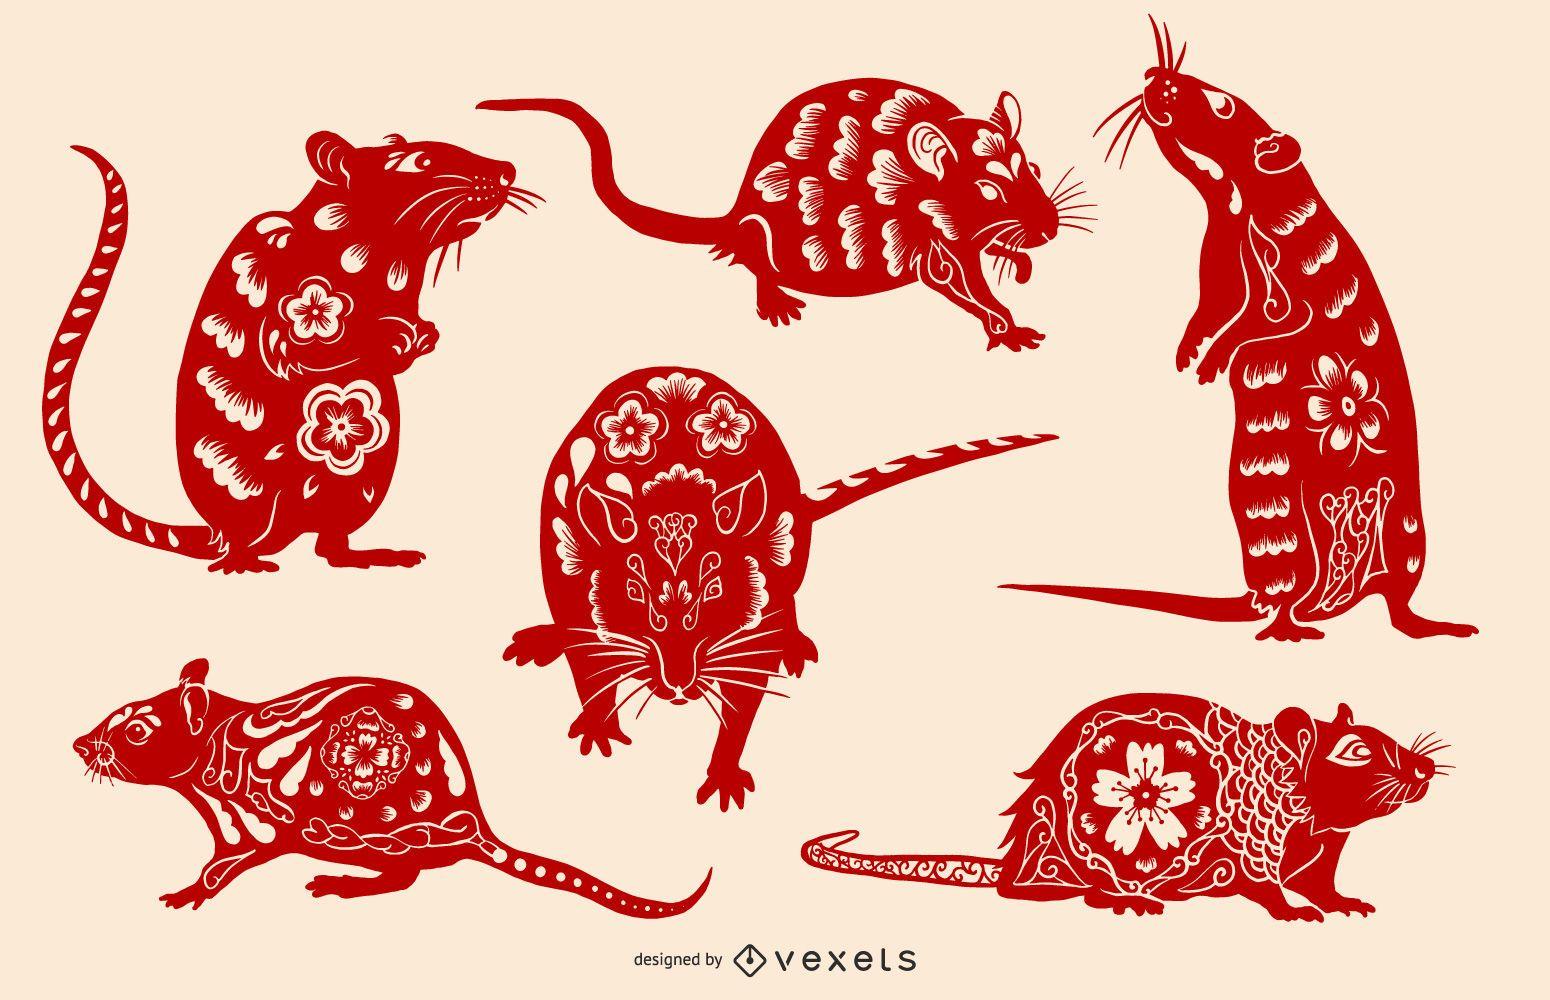 Chinese New Year 2020 Rat Illustration Set